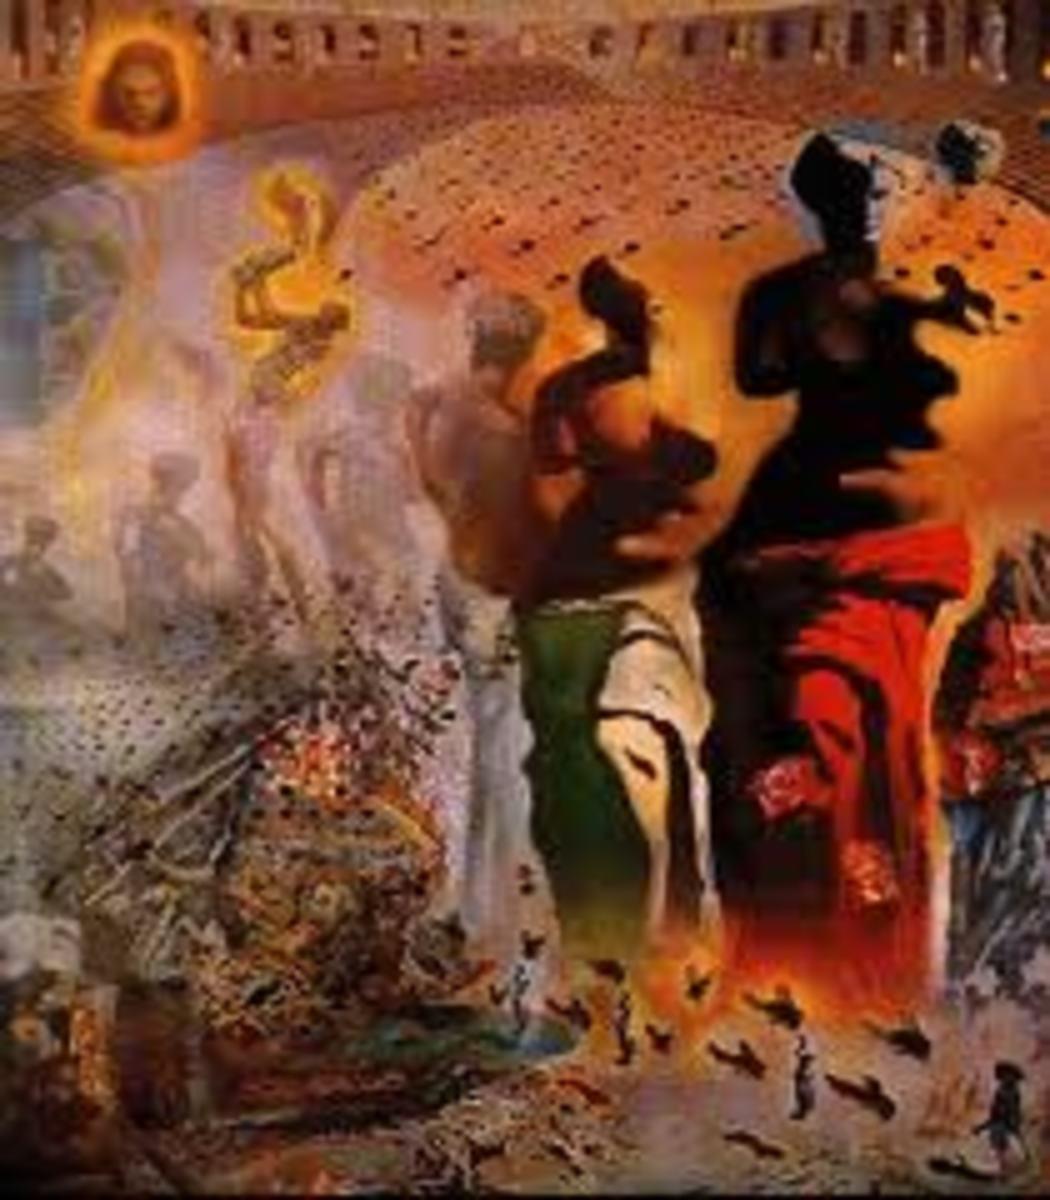 Salvadore Dali - The Hallucinogenic Toreador